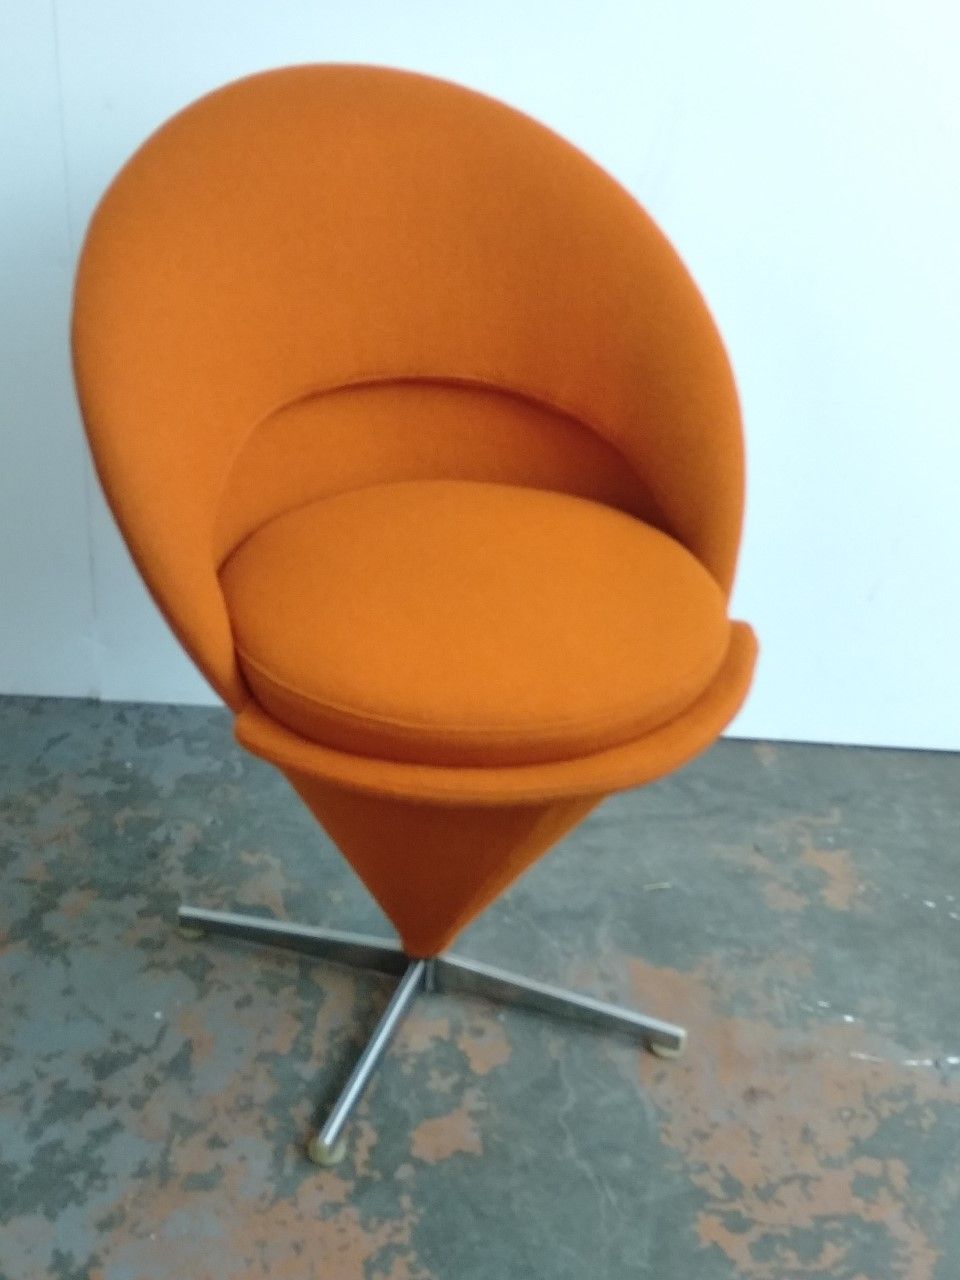 Cone Chair Verner Panton